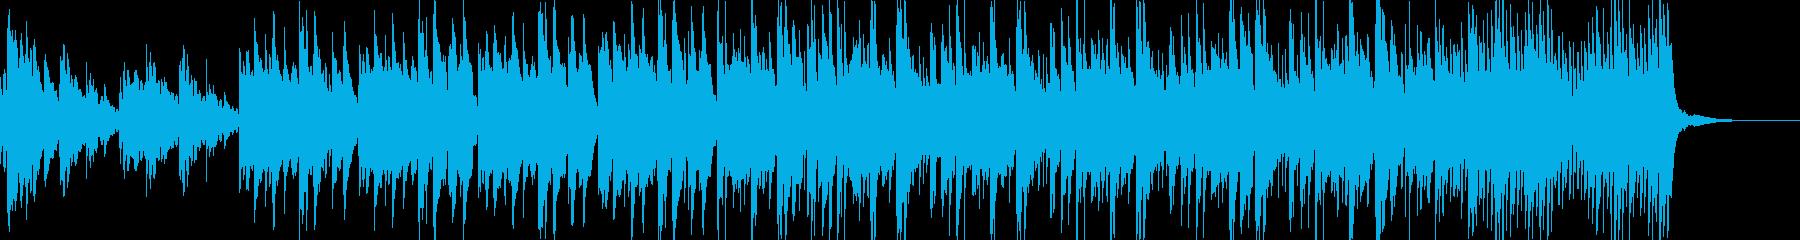 Children's room's reproduced waveform